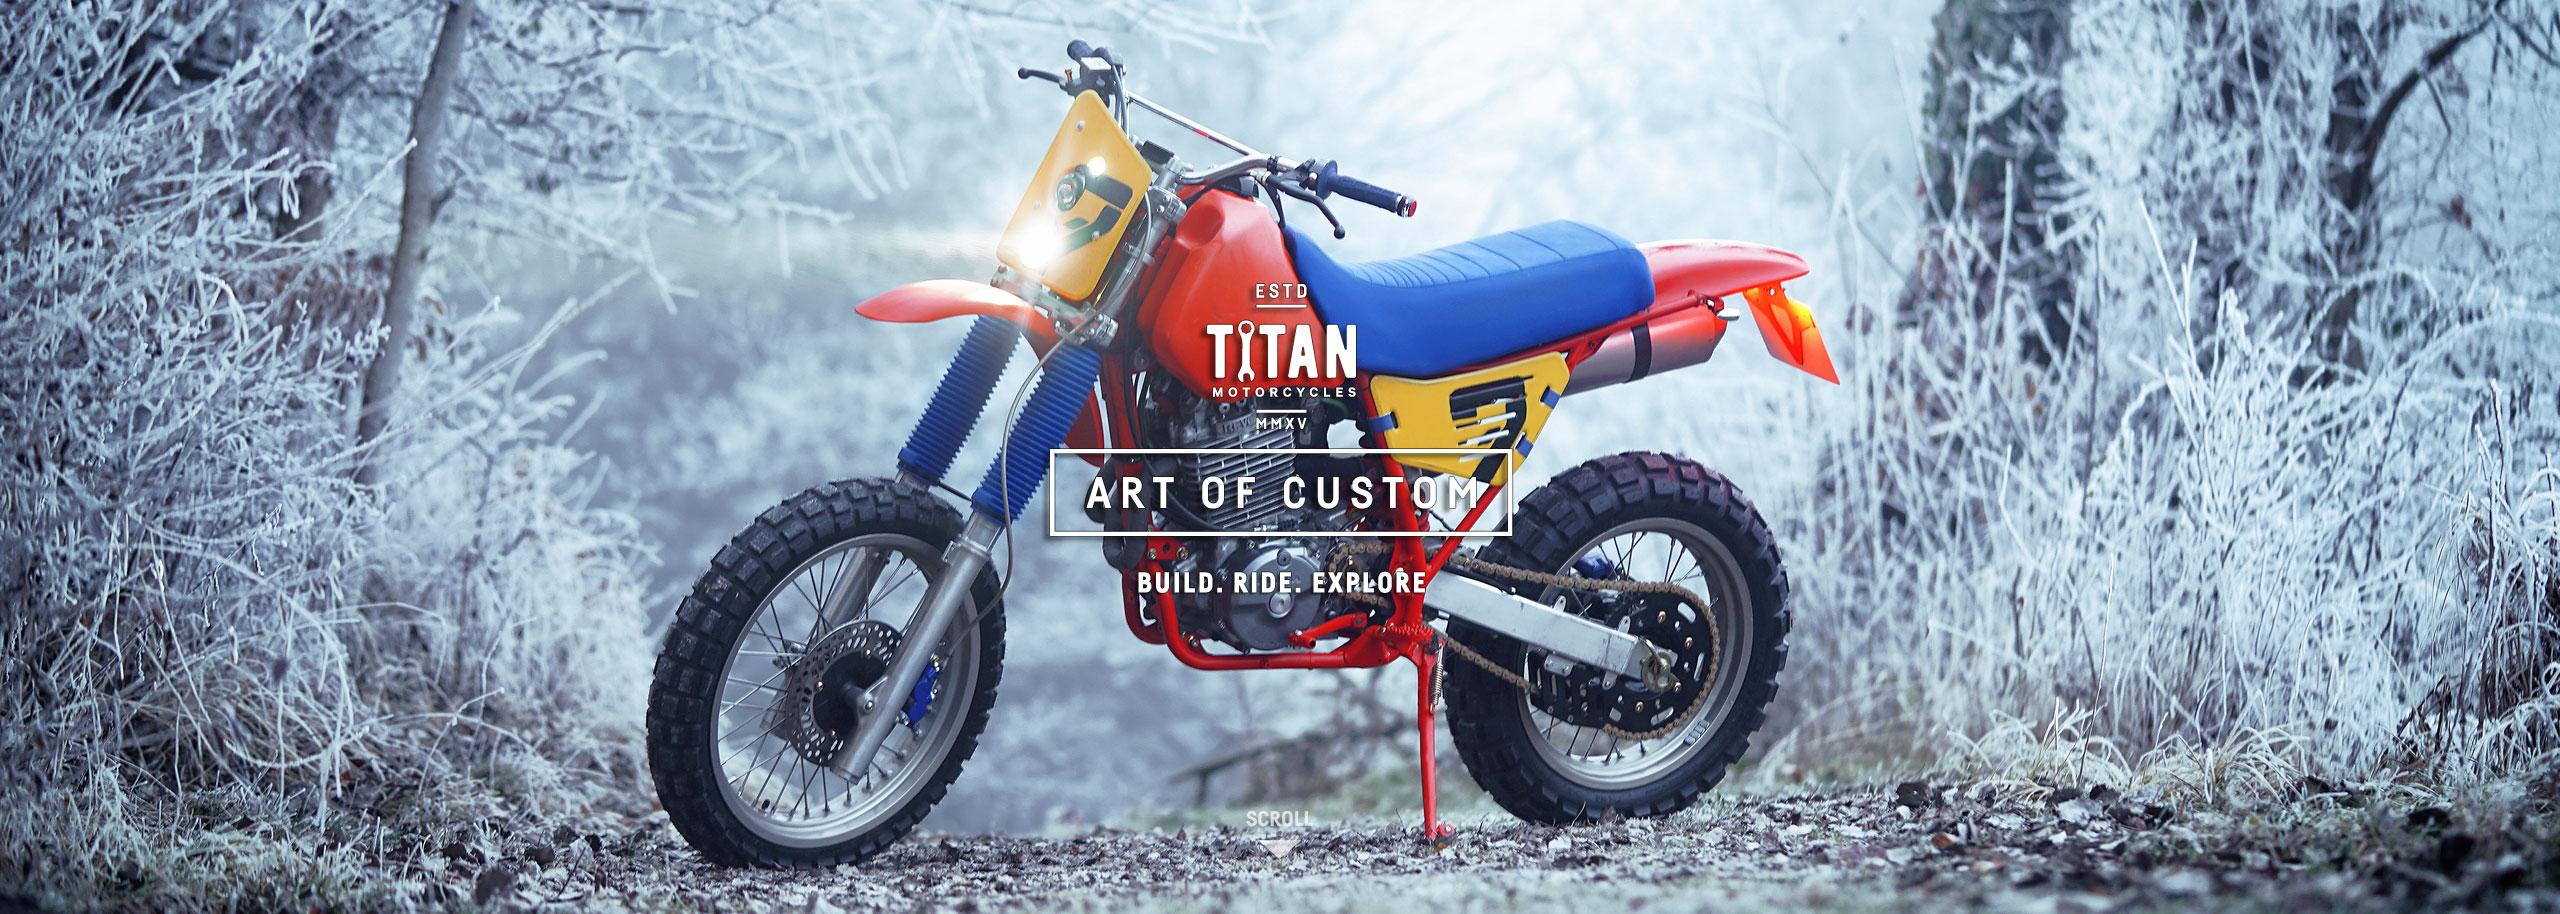 01_Urban-Crosser-Honda-XR600-Titan-Motorcycle-Co-Austria-Typisiert-Graz-Custom-Bikes-made-in-Styria-Austria